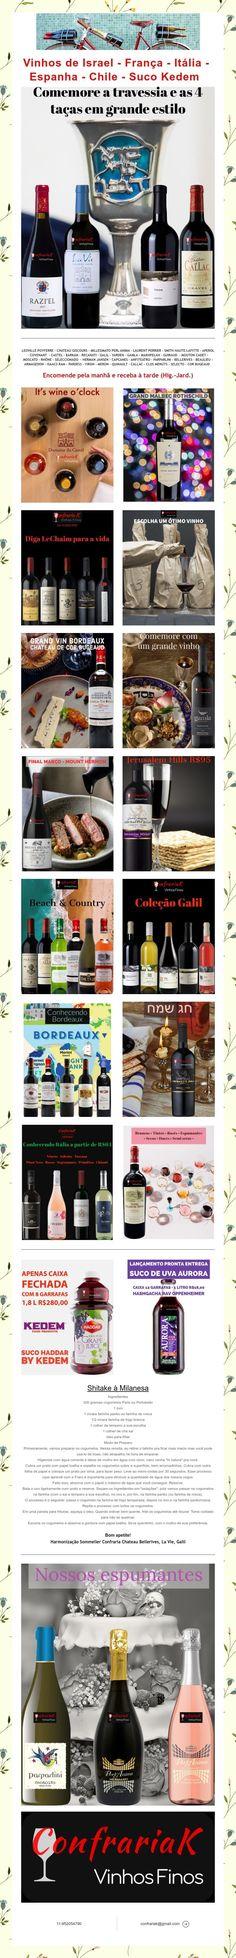 Vinhos de Israel - França - Itália - Espanha - Chile - Suco Kedem Mouton Cadet, Laurent Perrier, Israel, Chile, 1, Juice, Wine Pairings, Spain, Italia